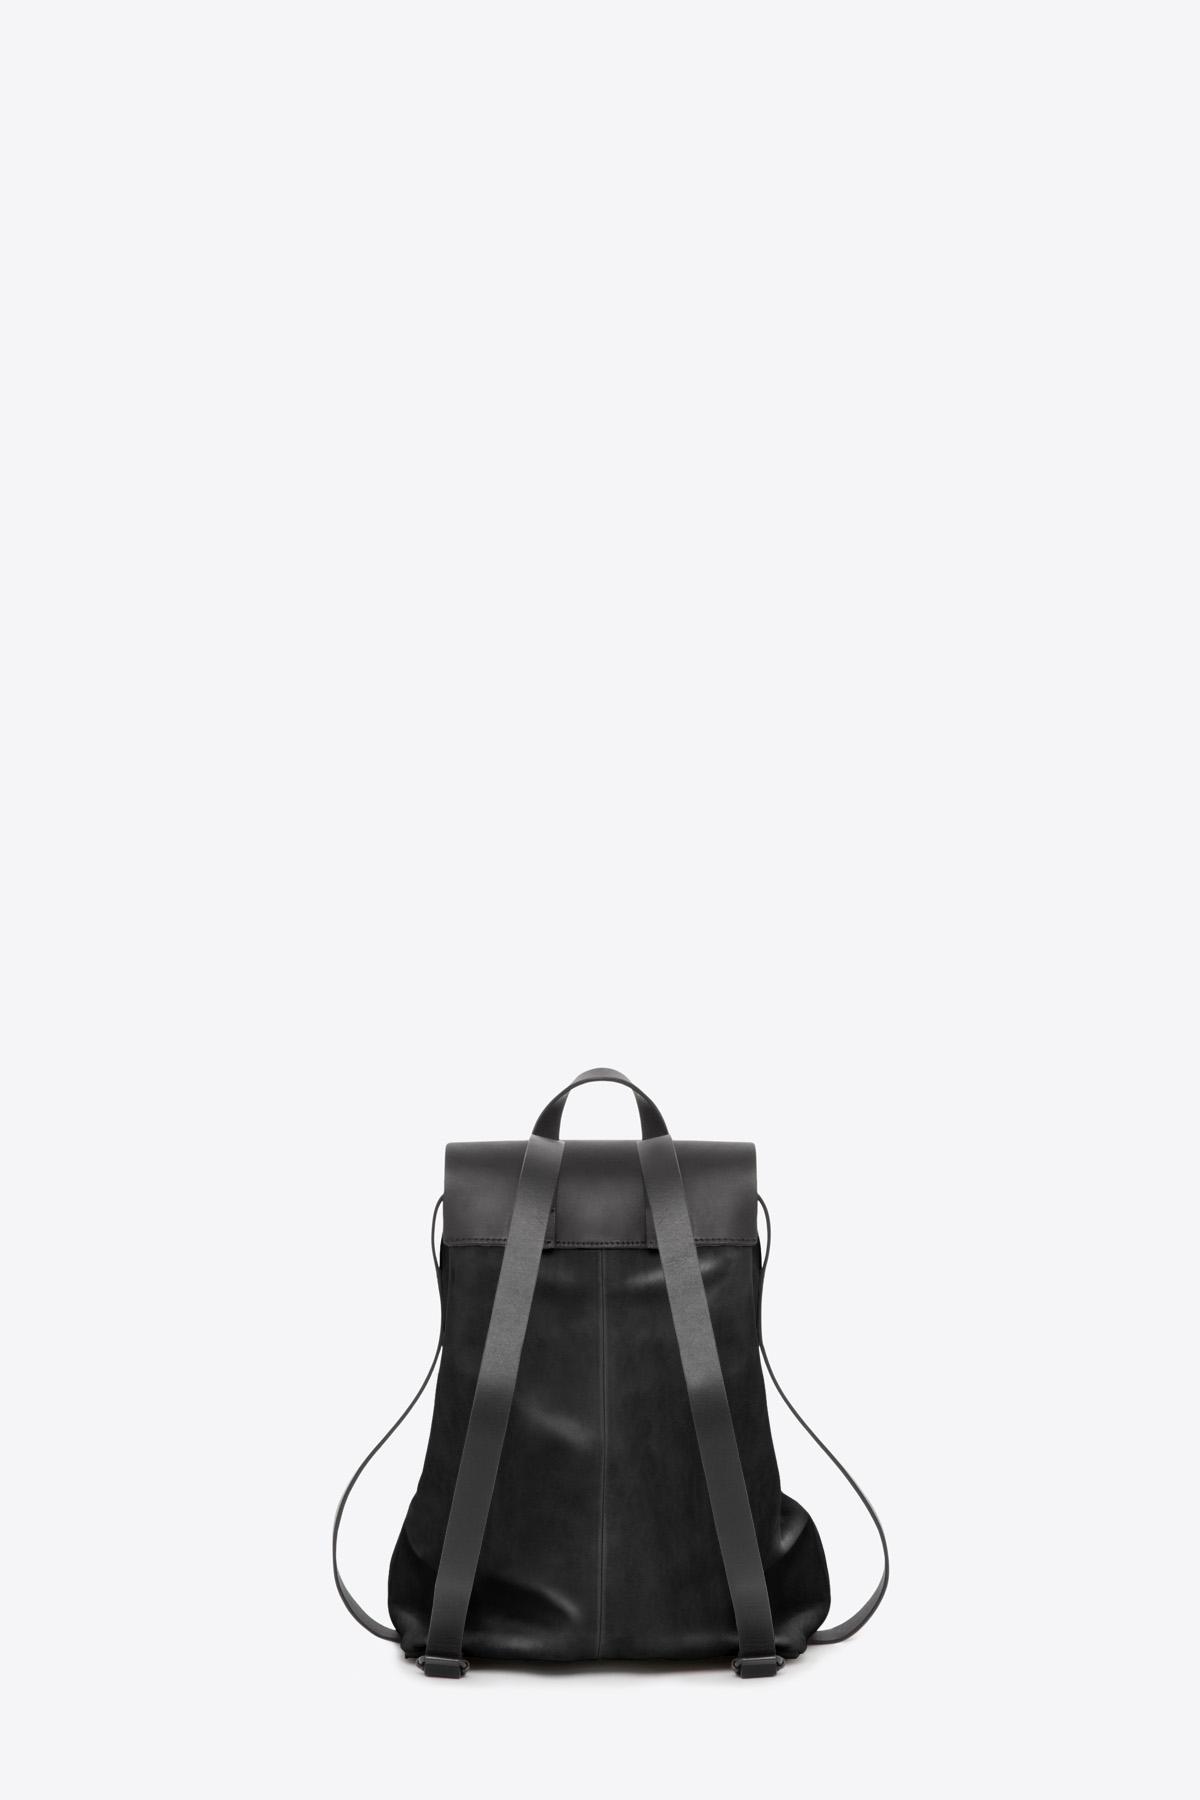 dclr009-b-backpack-a1-black-back